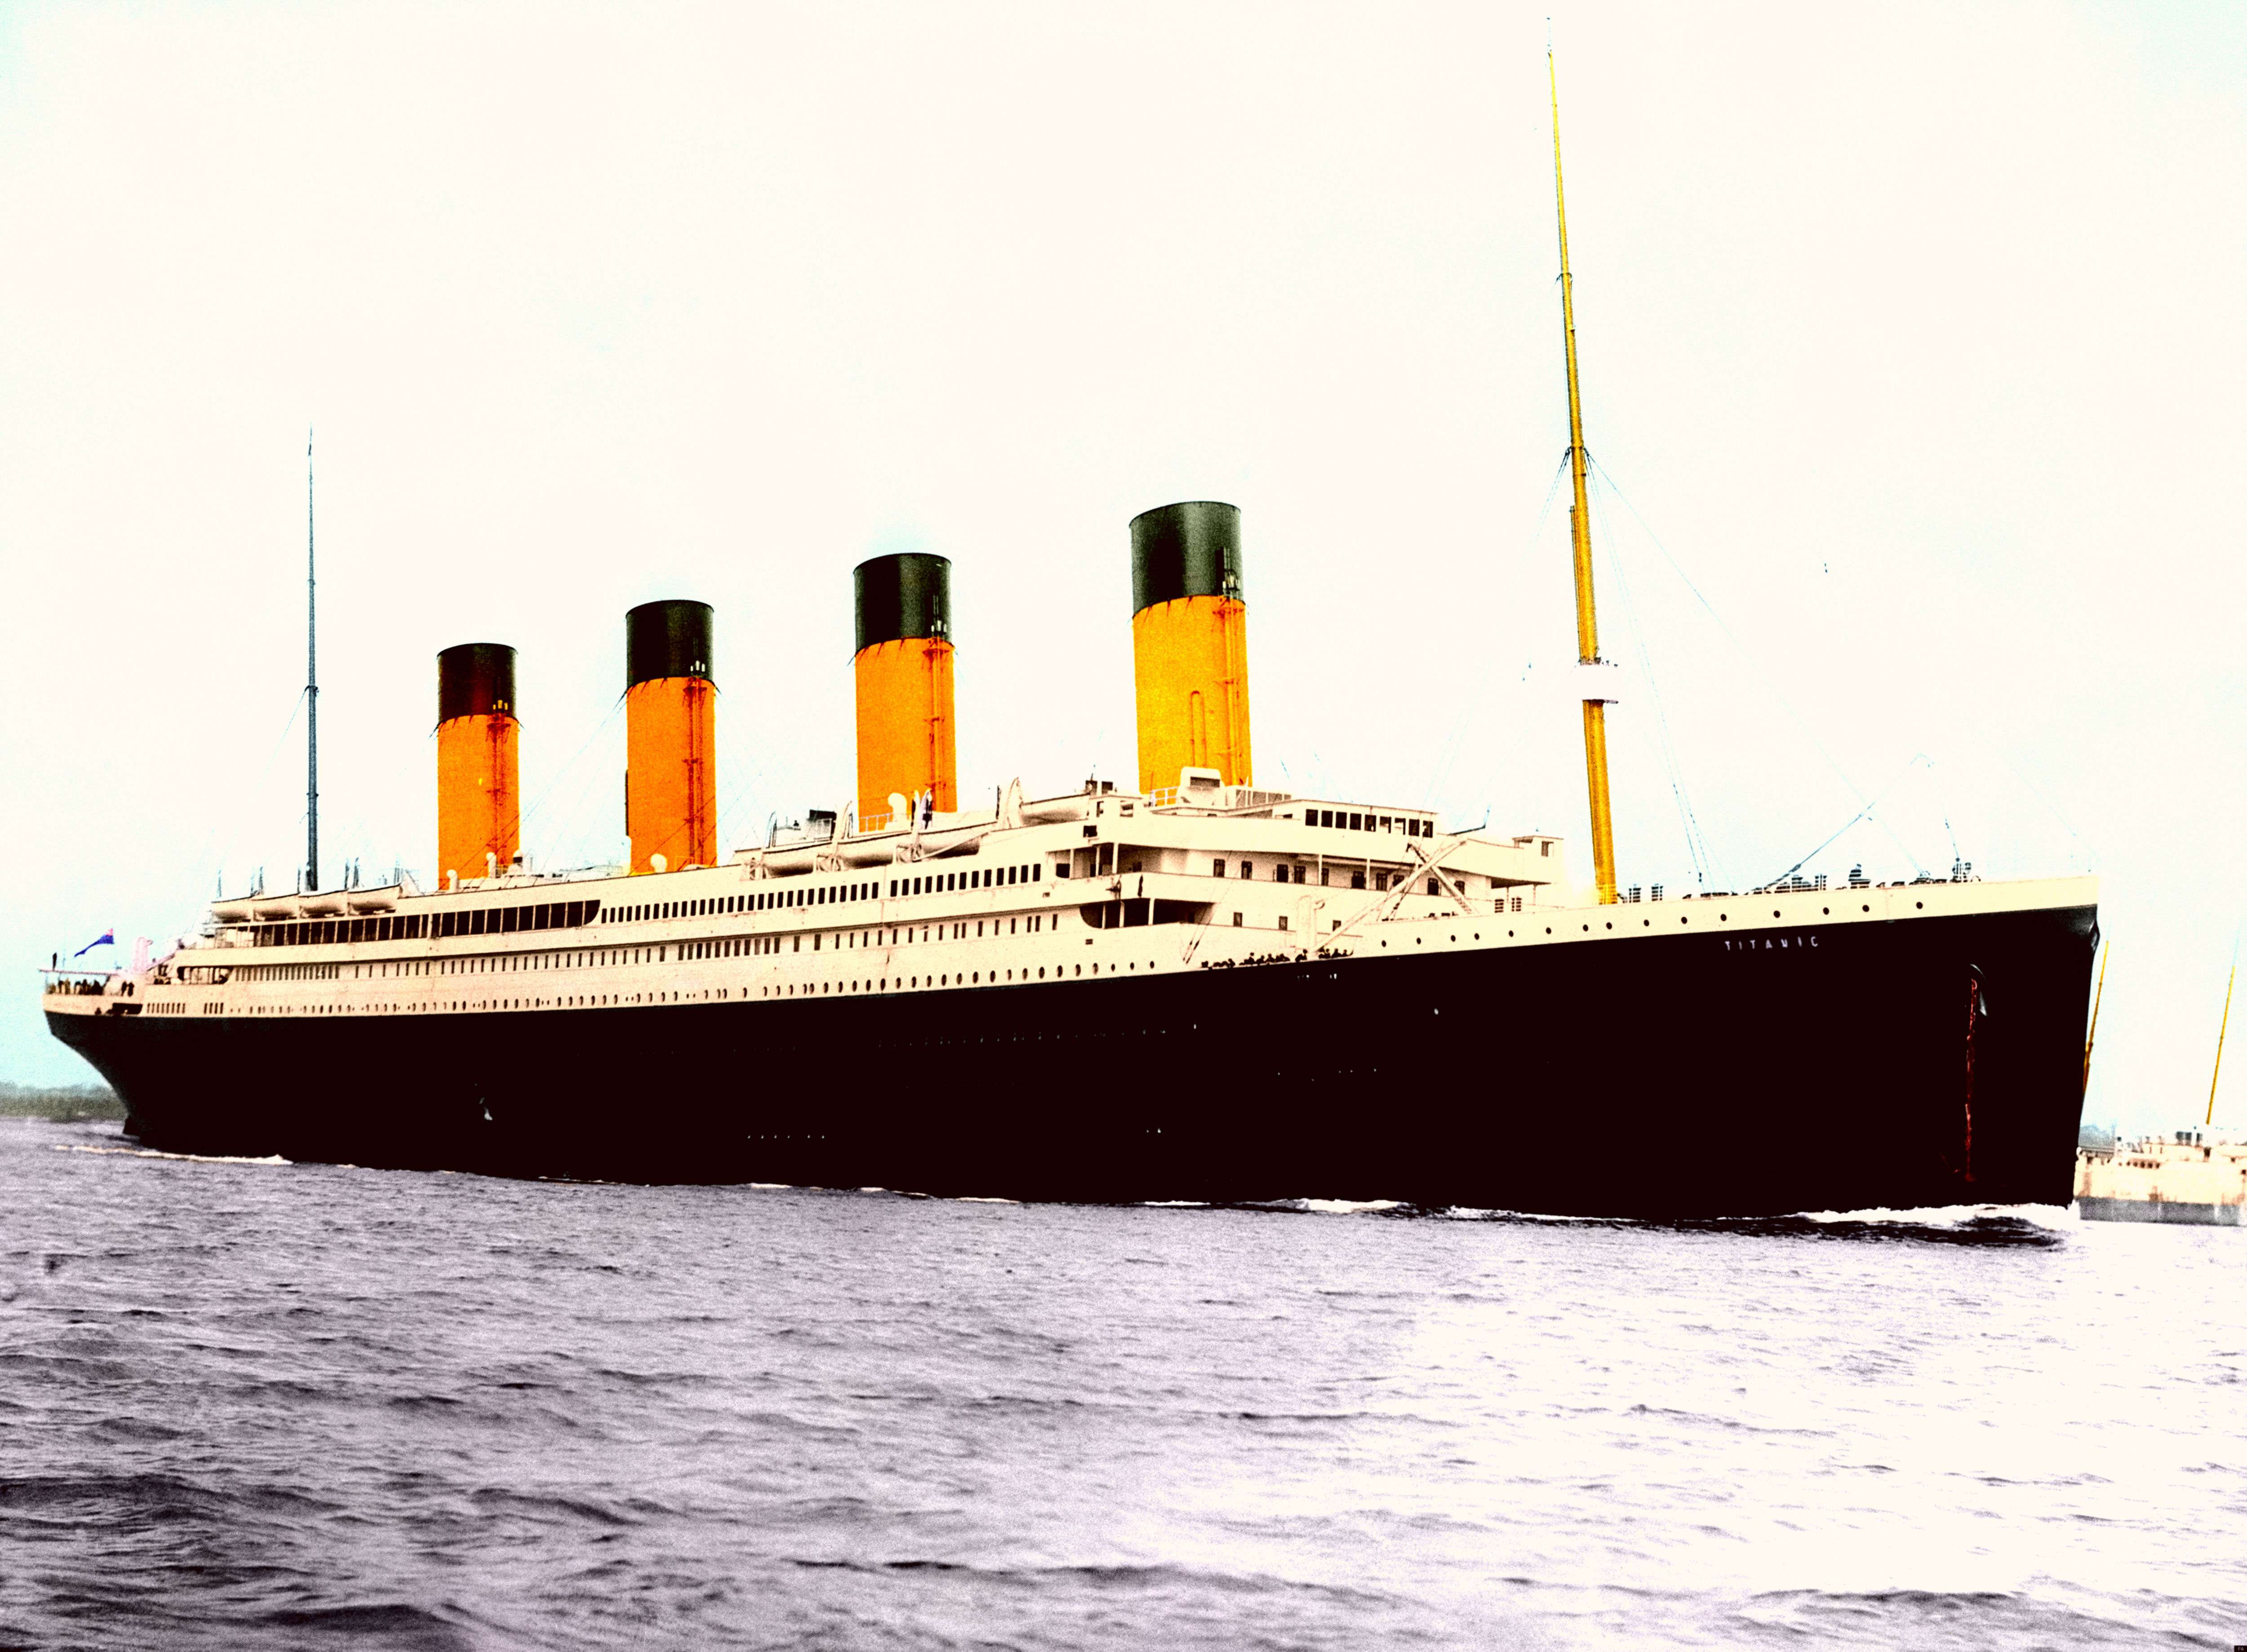 Rms Titanic Tinting History